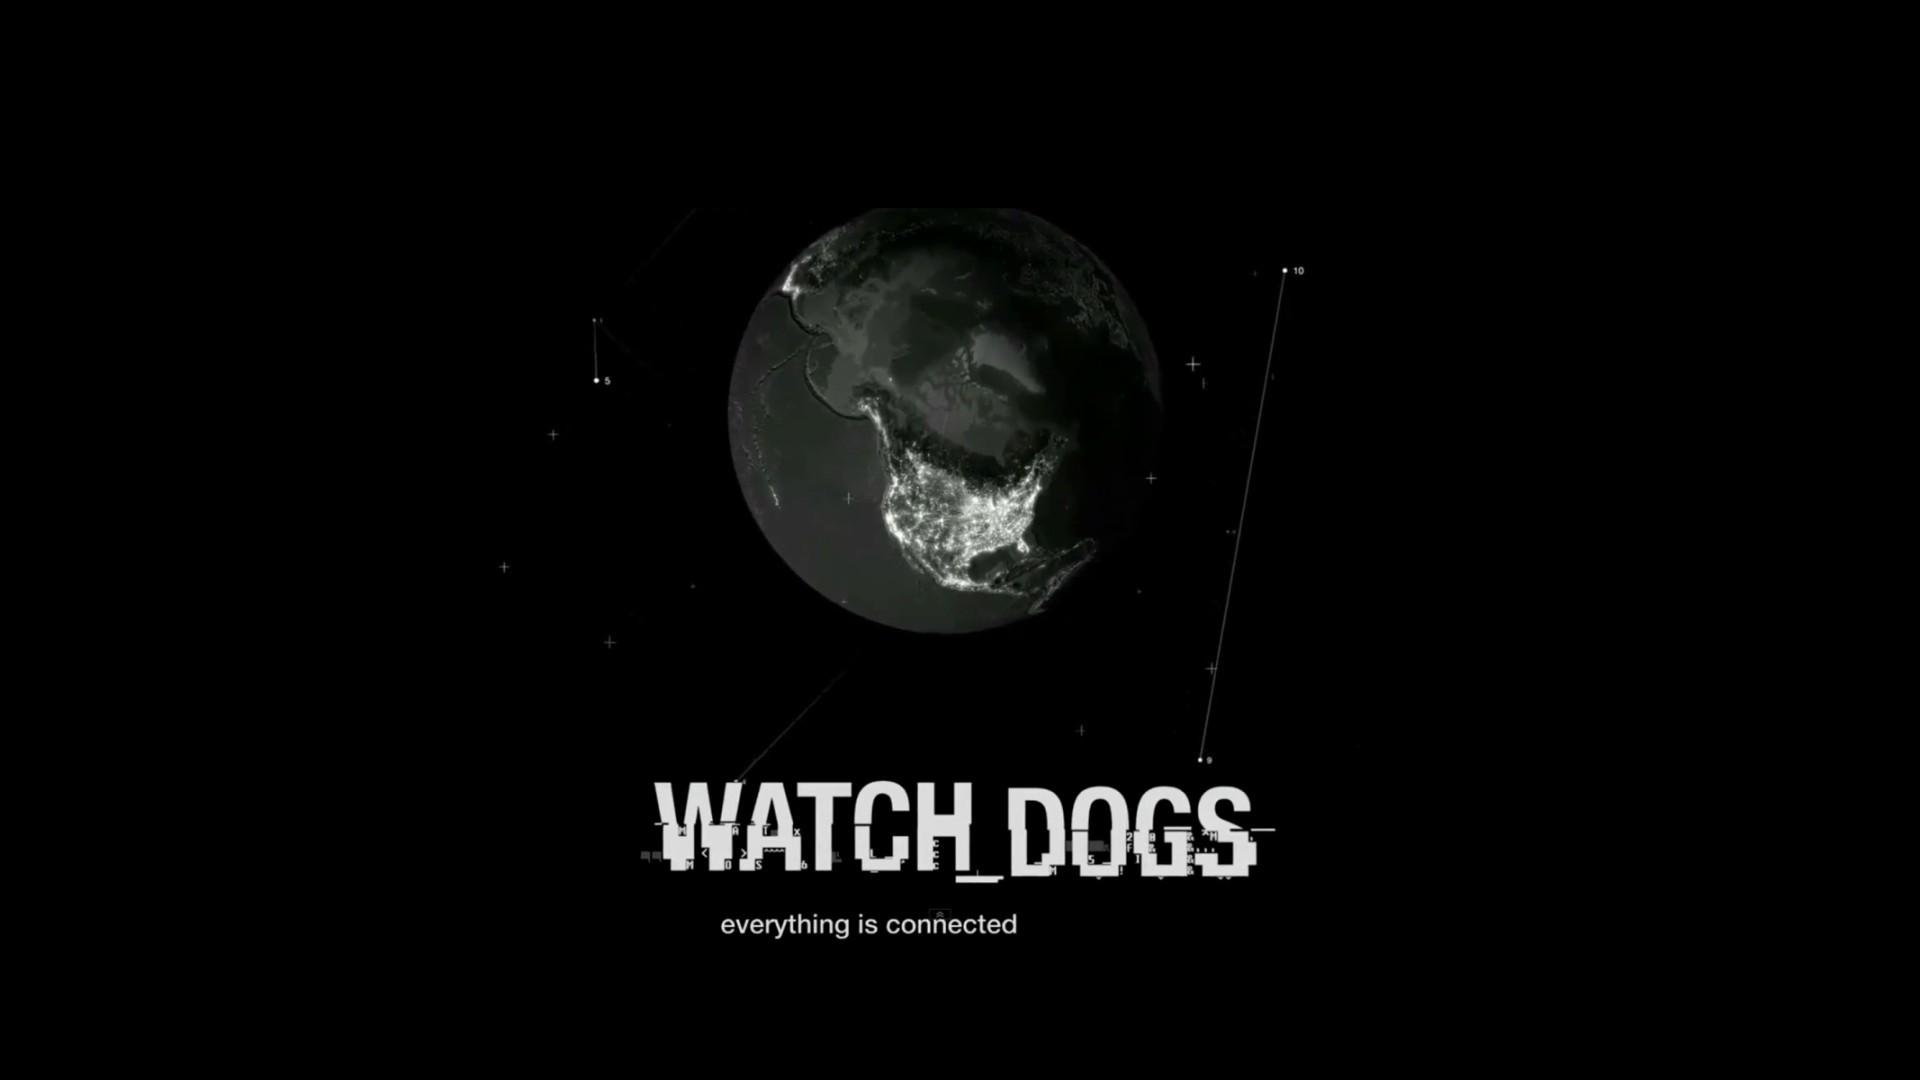 Wallpaper iphone watch dogs - 1920x1080 Aiden Pearce Ubisoft Watch Dogs Cyberpunk Video Games Wallpaper 2629205 Wallbase